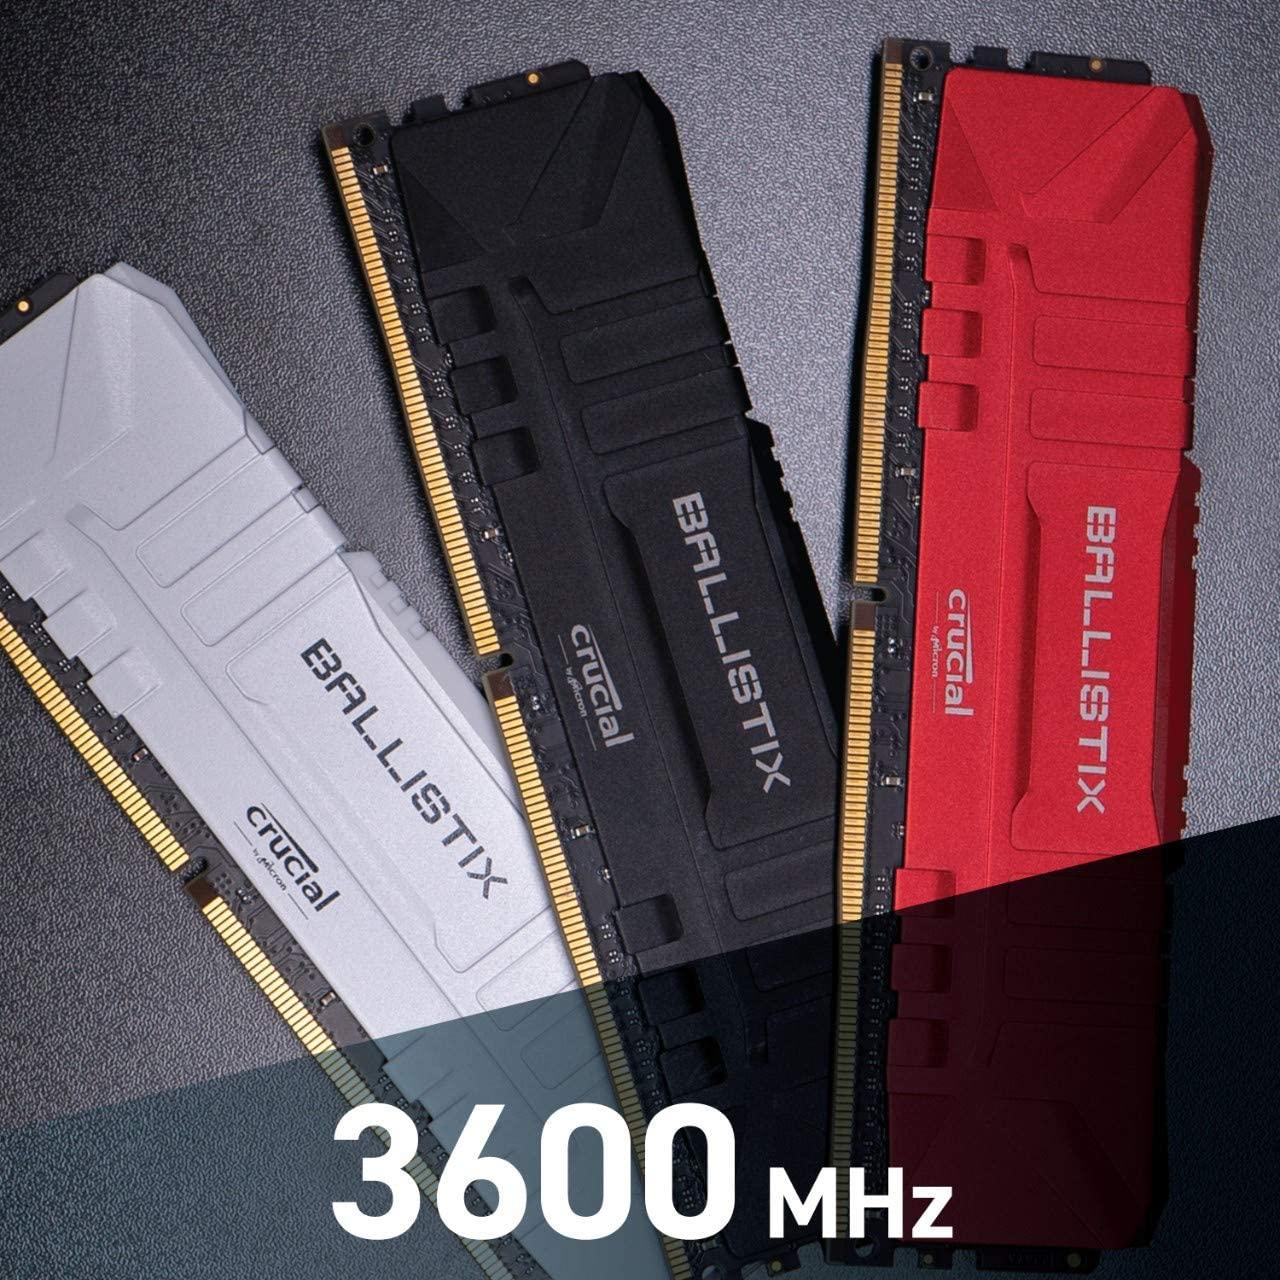 Crucial Ballistix Desktop Gaming Memory Kit Snelheid: 3600 MHz, CL16 (2x8GB)